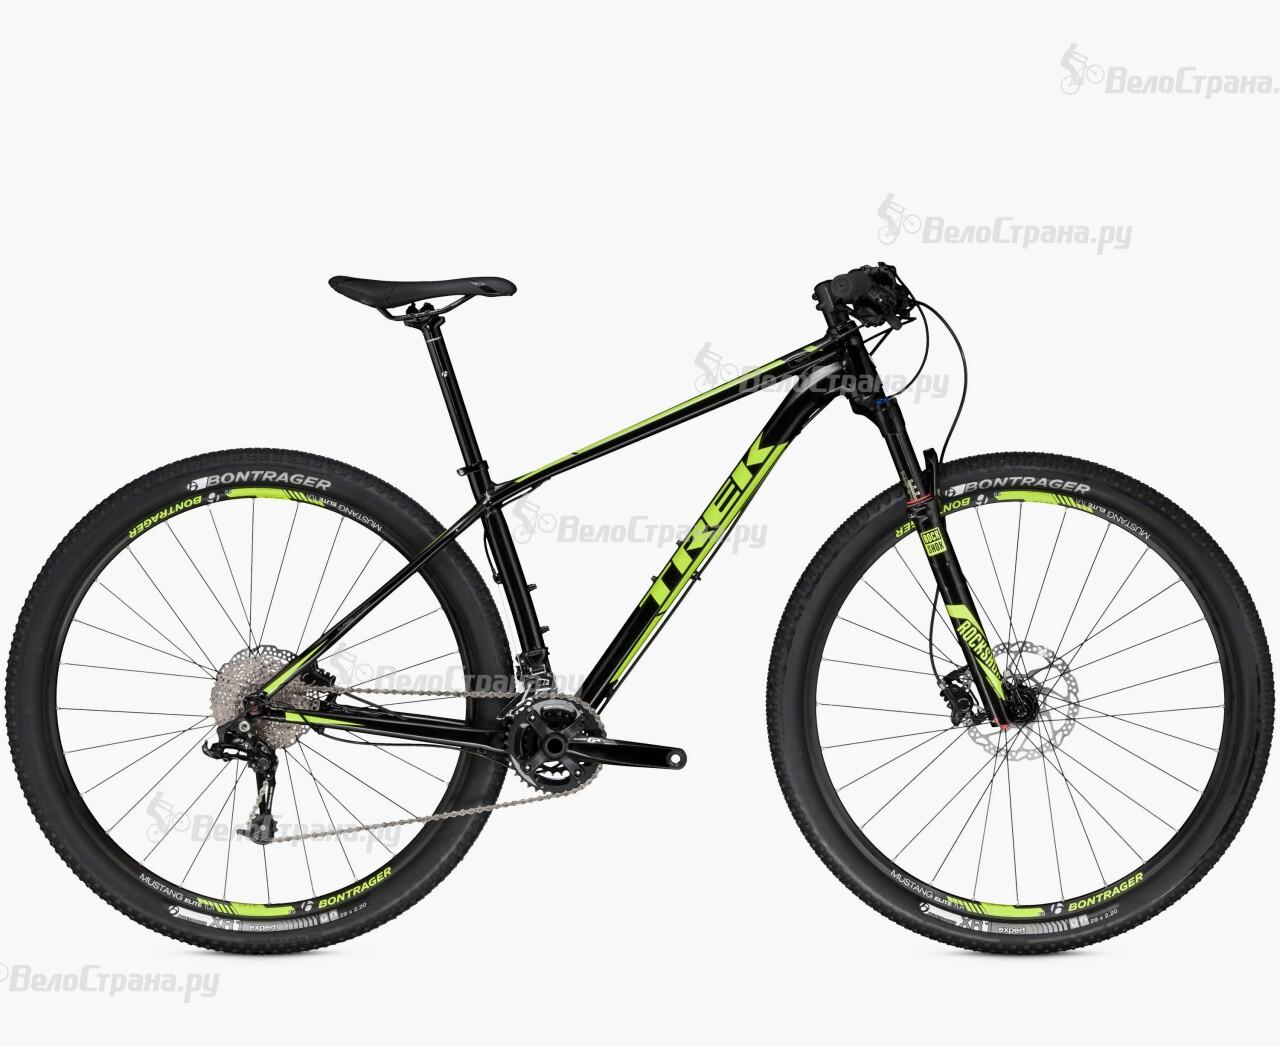 Велосипед Trek Superfly 6 29 (2016) цены онлайн